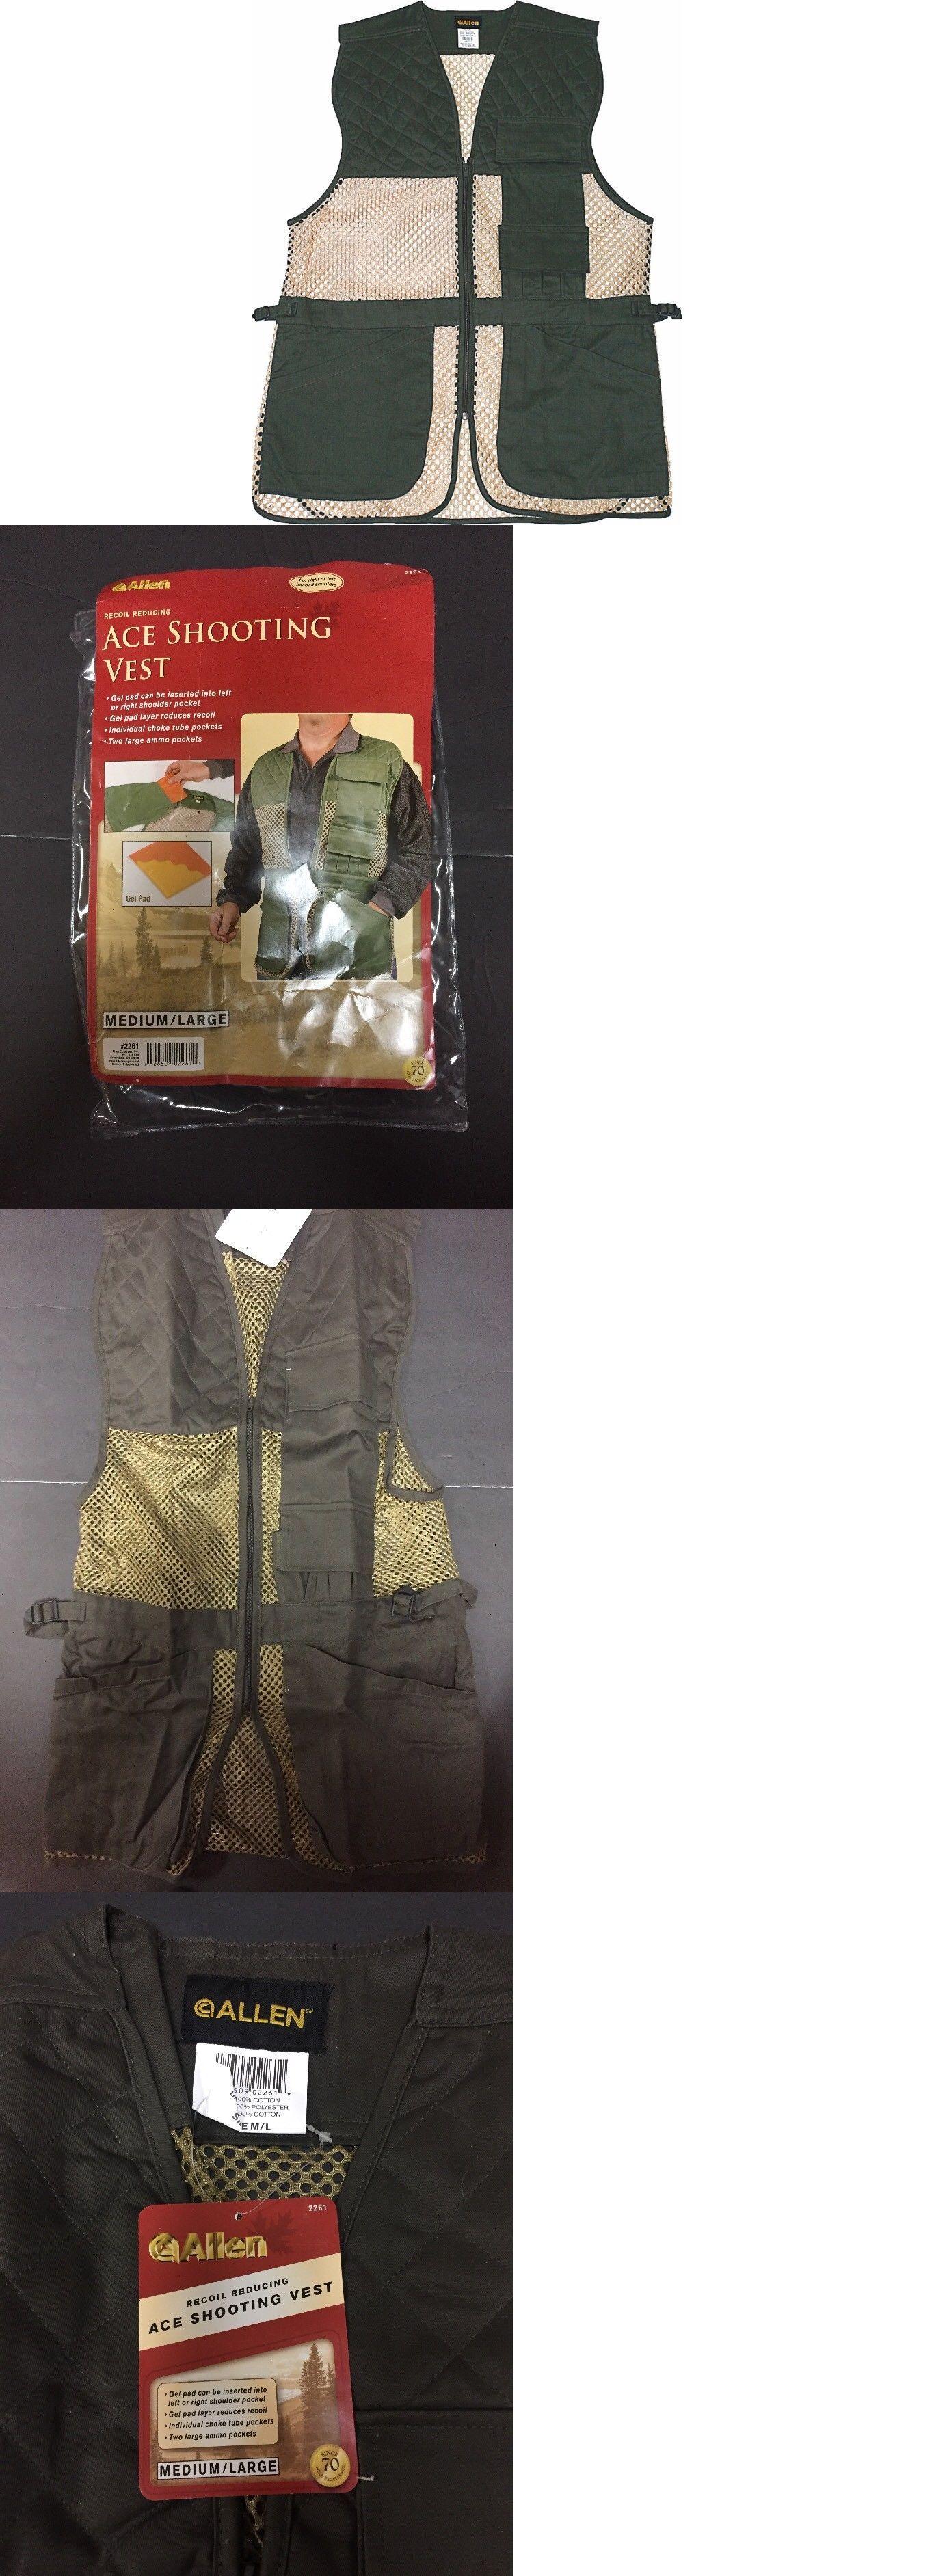 d0b2d94d588d6 Vests 178080: Allen Company Ace Recoil Reducing Shooting Vest M L Right  Hand Or Left Hand